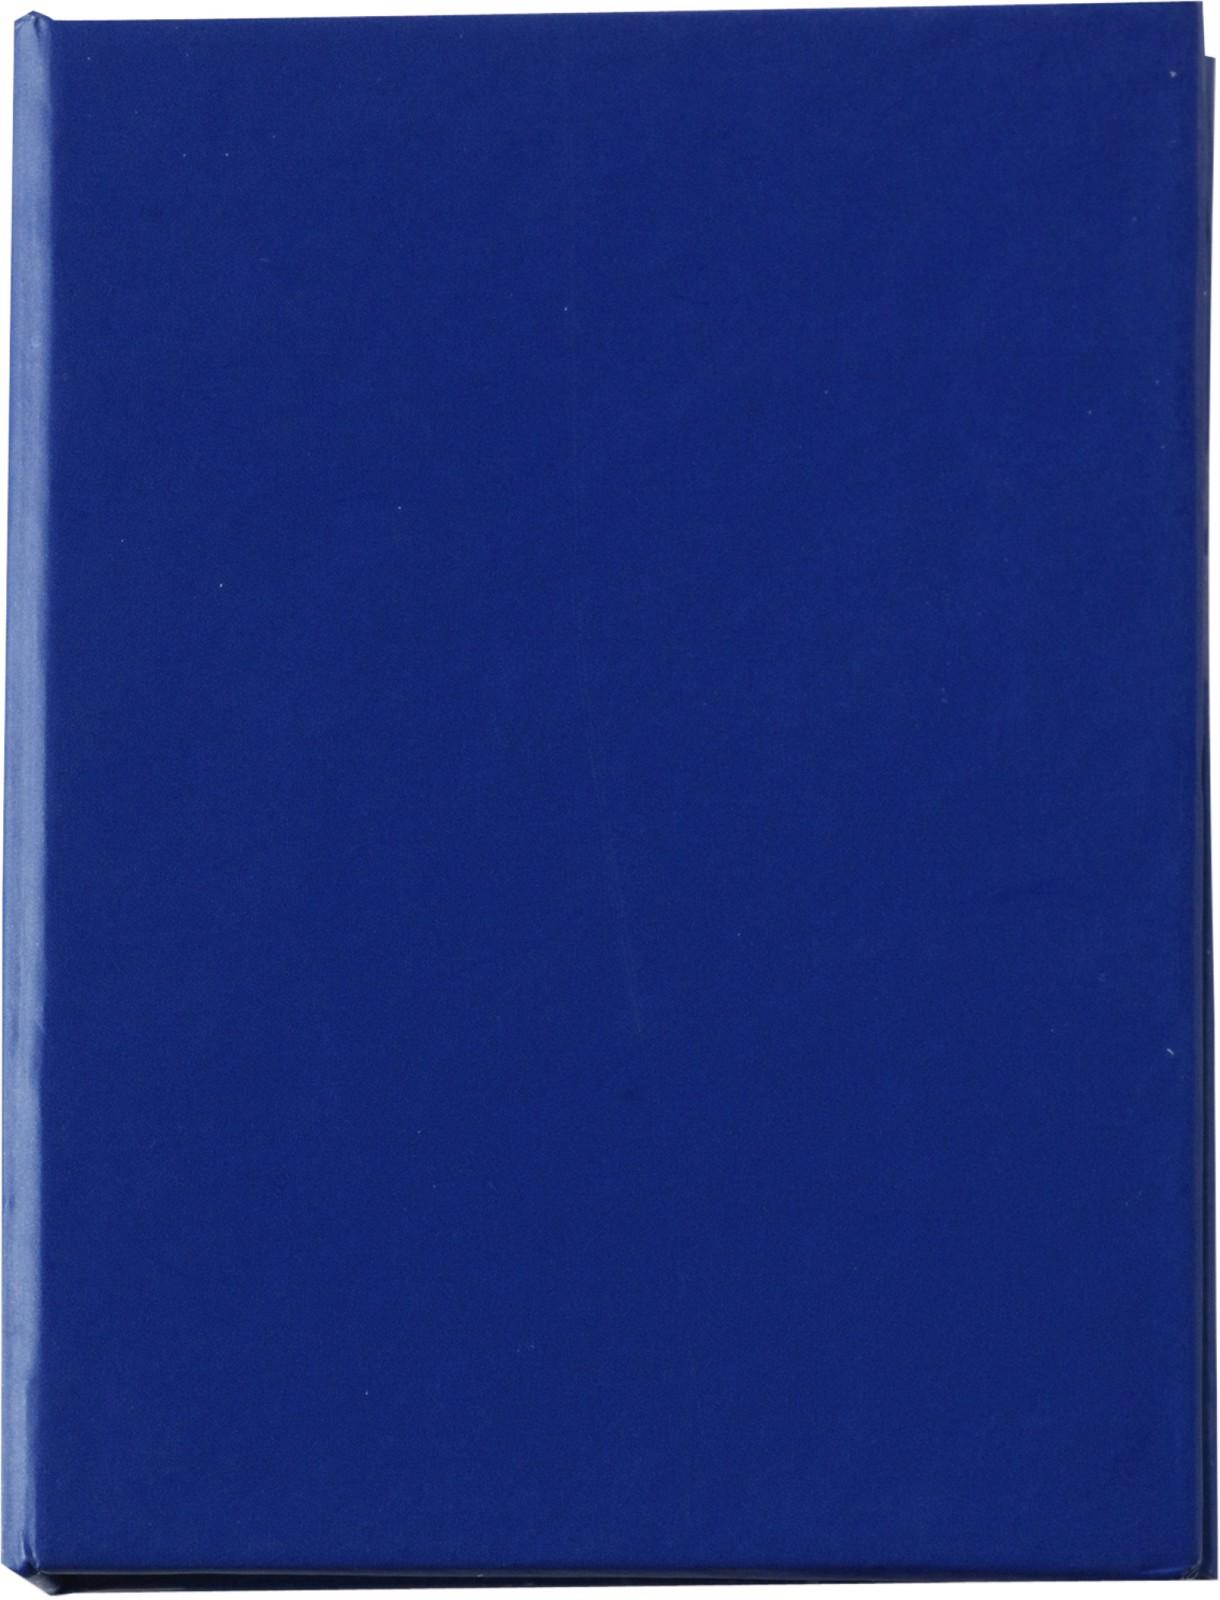 Cardboard holder with sticky notes - Blue